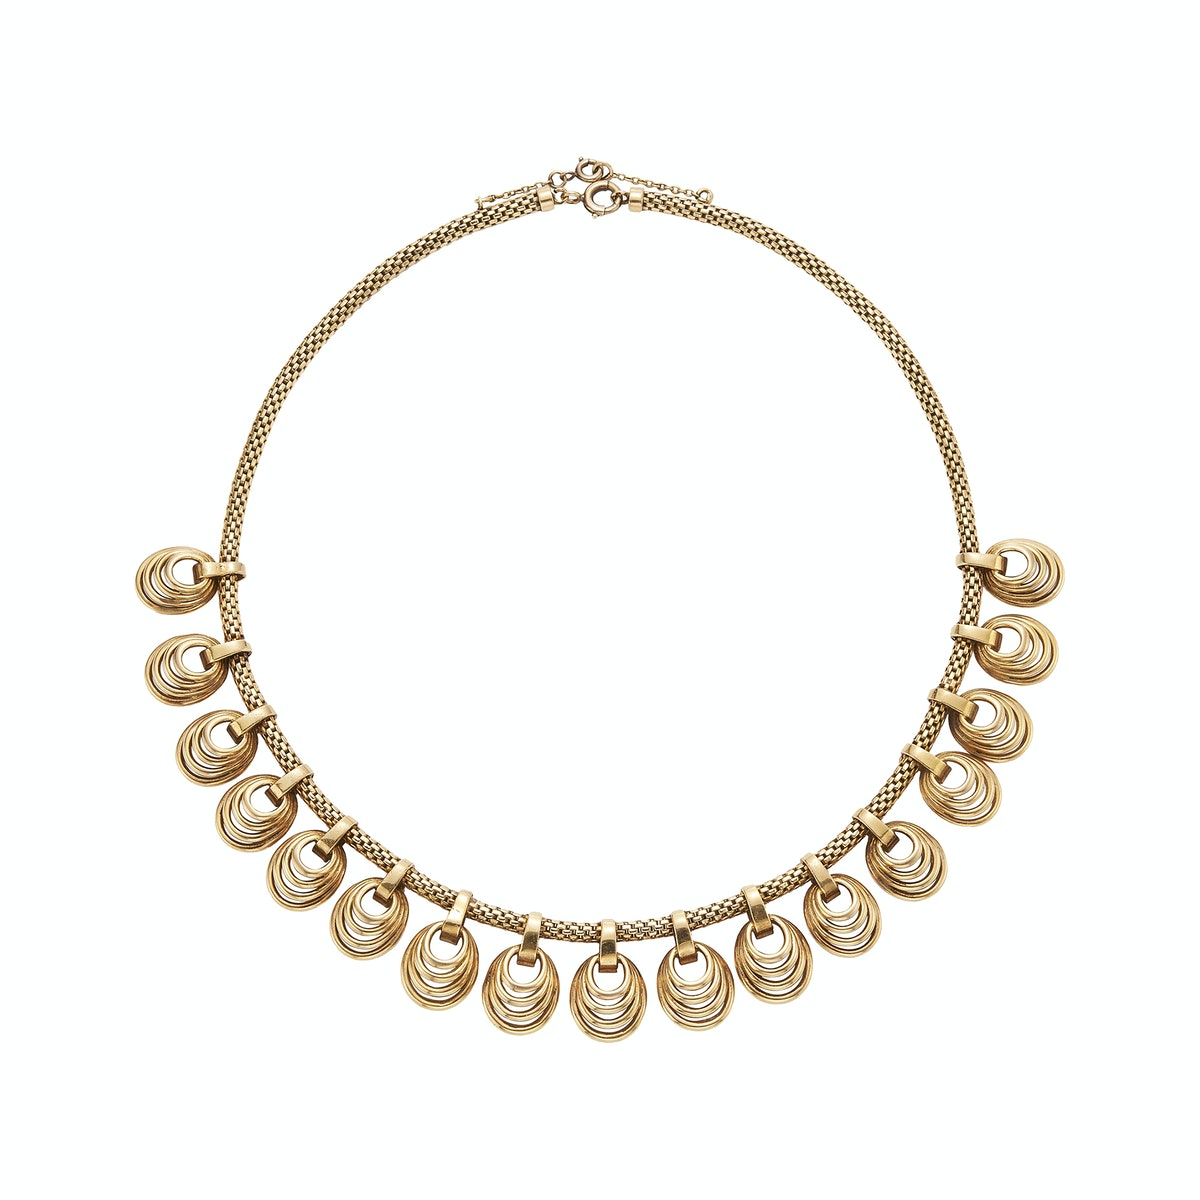 Gold swirled pendant necklace